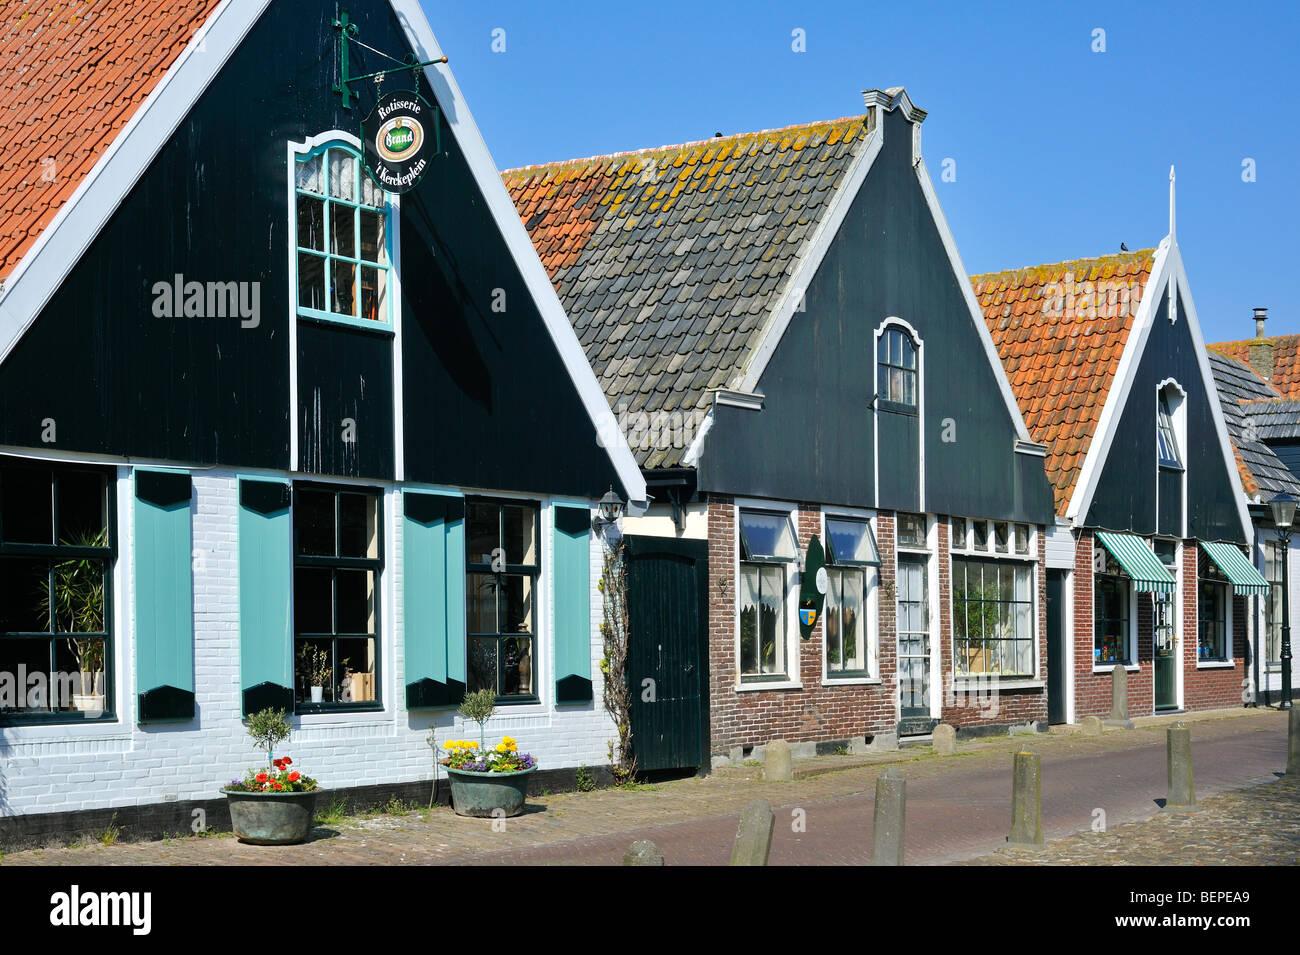 Traditionelle Häuser im Dorf Oosterend Texel Niederlande